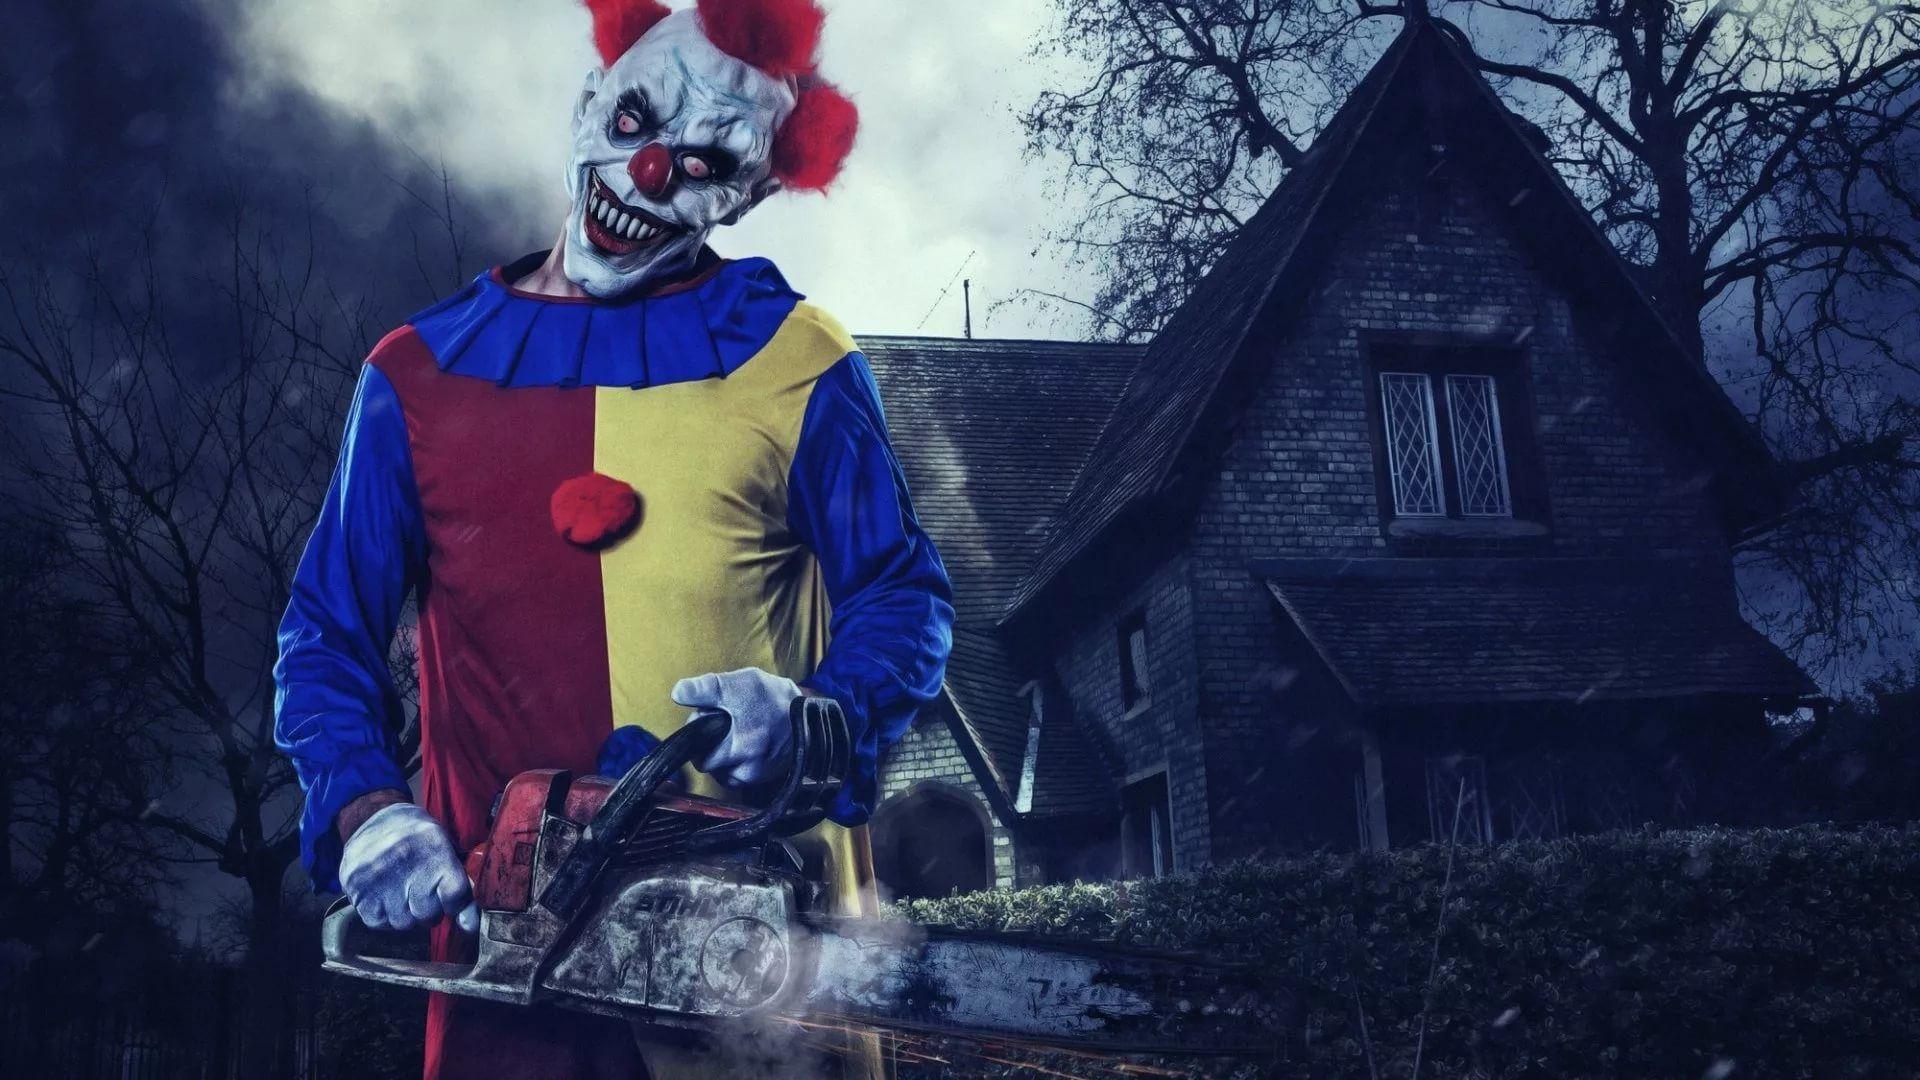 Killer Clown Background Wallpaper HD